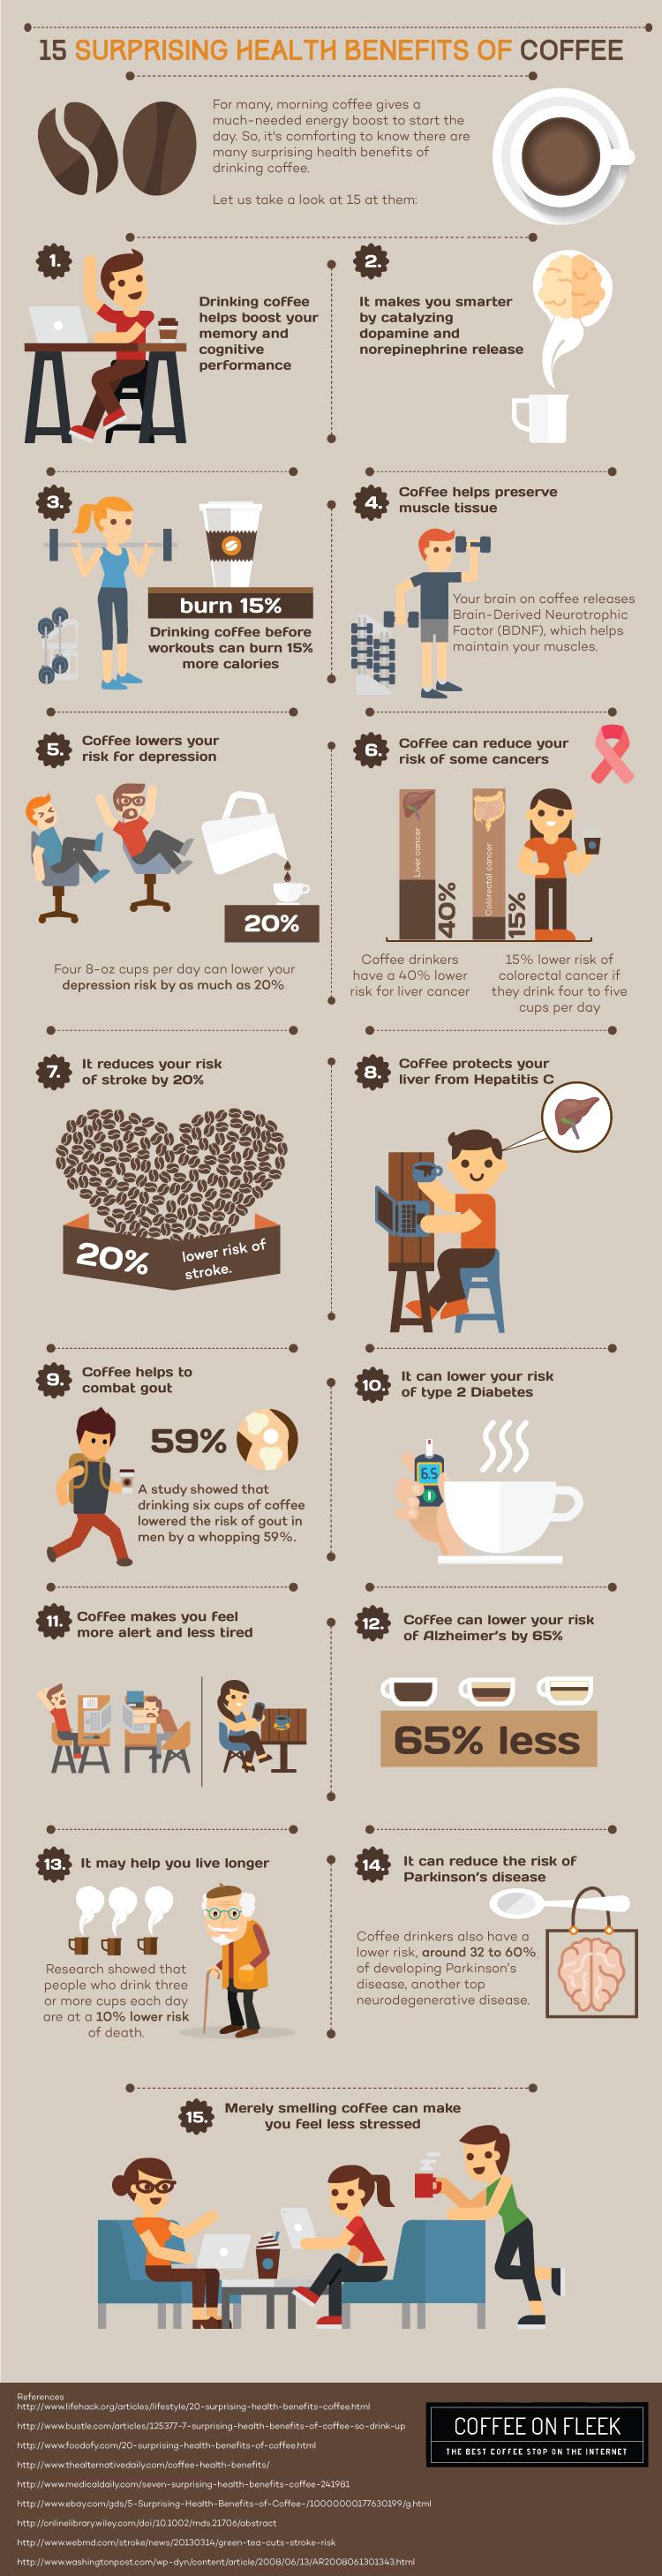 15 surprising health benefits of coffee